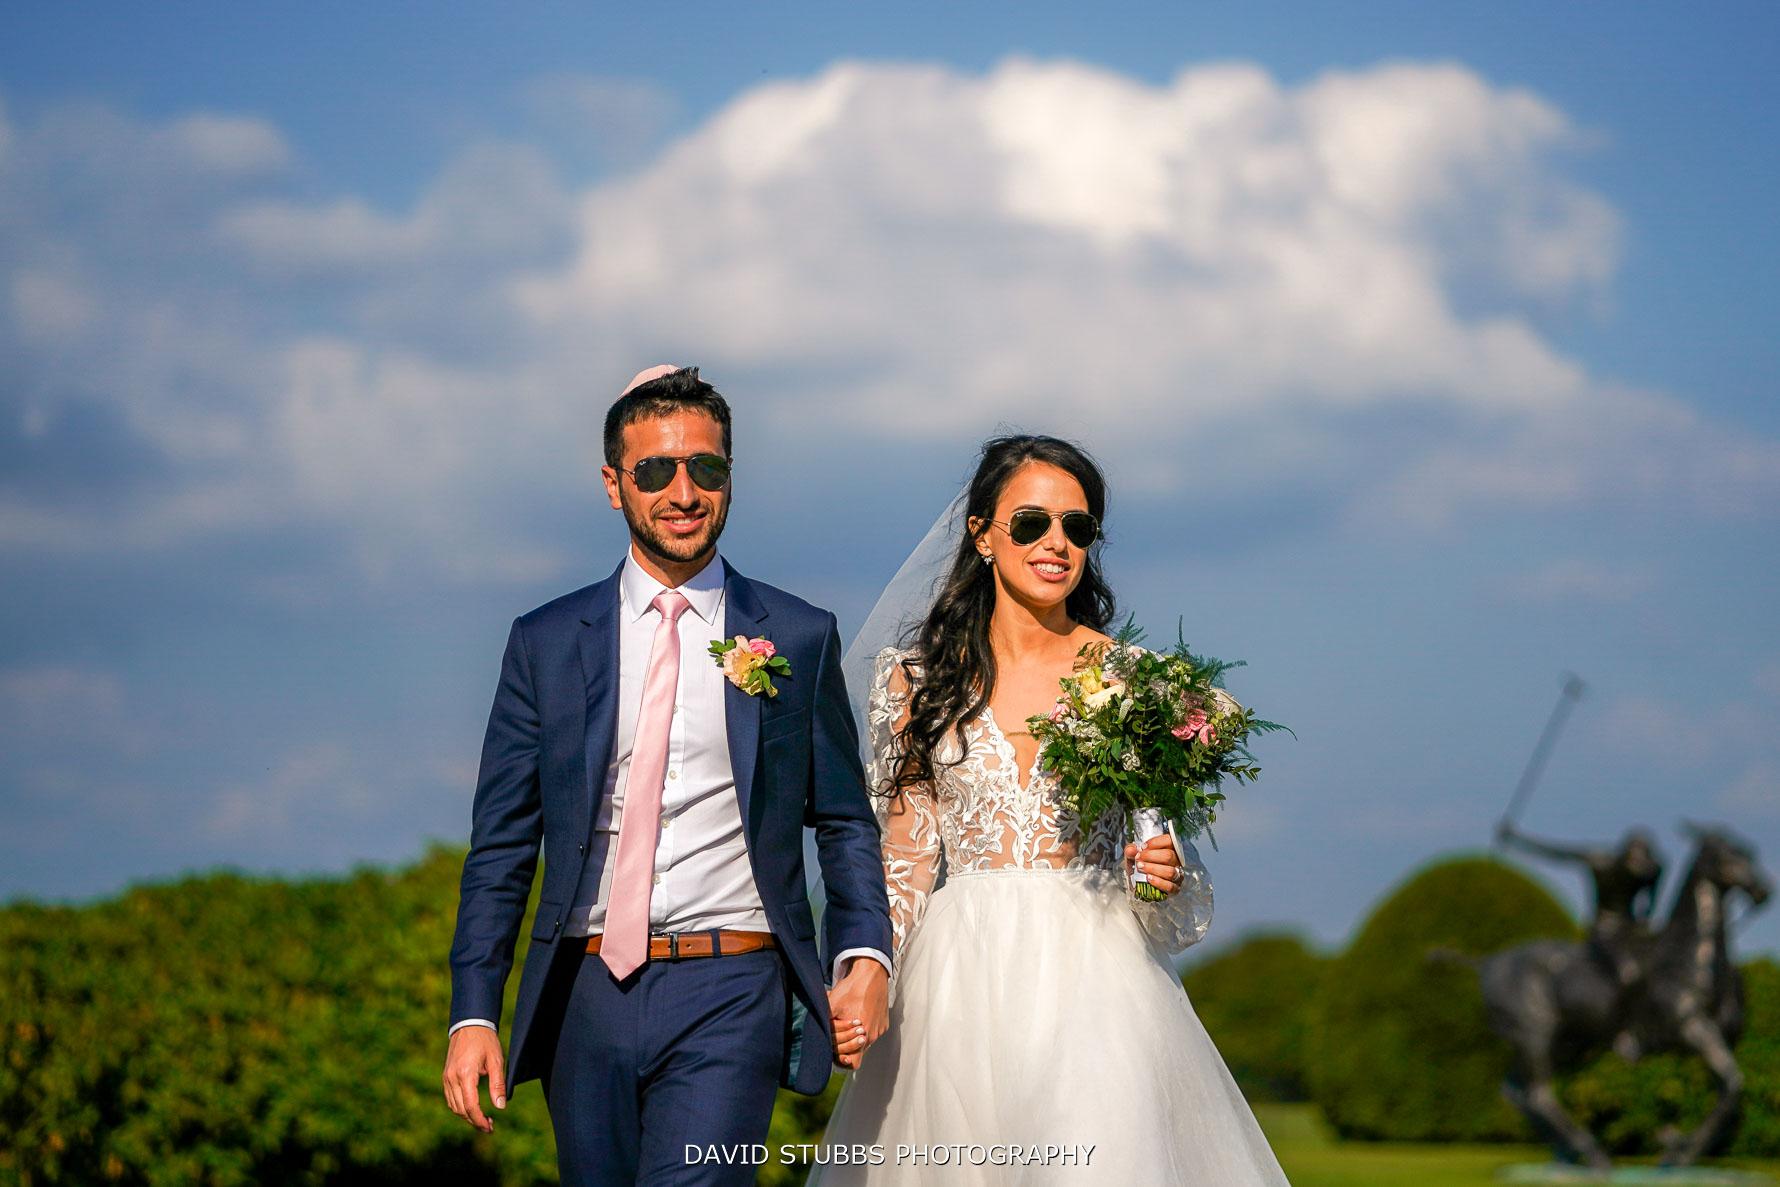 sunglasses at Uk wedding